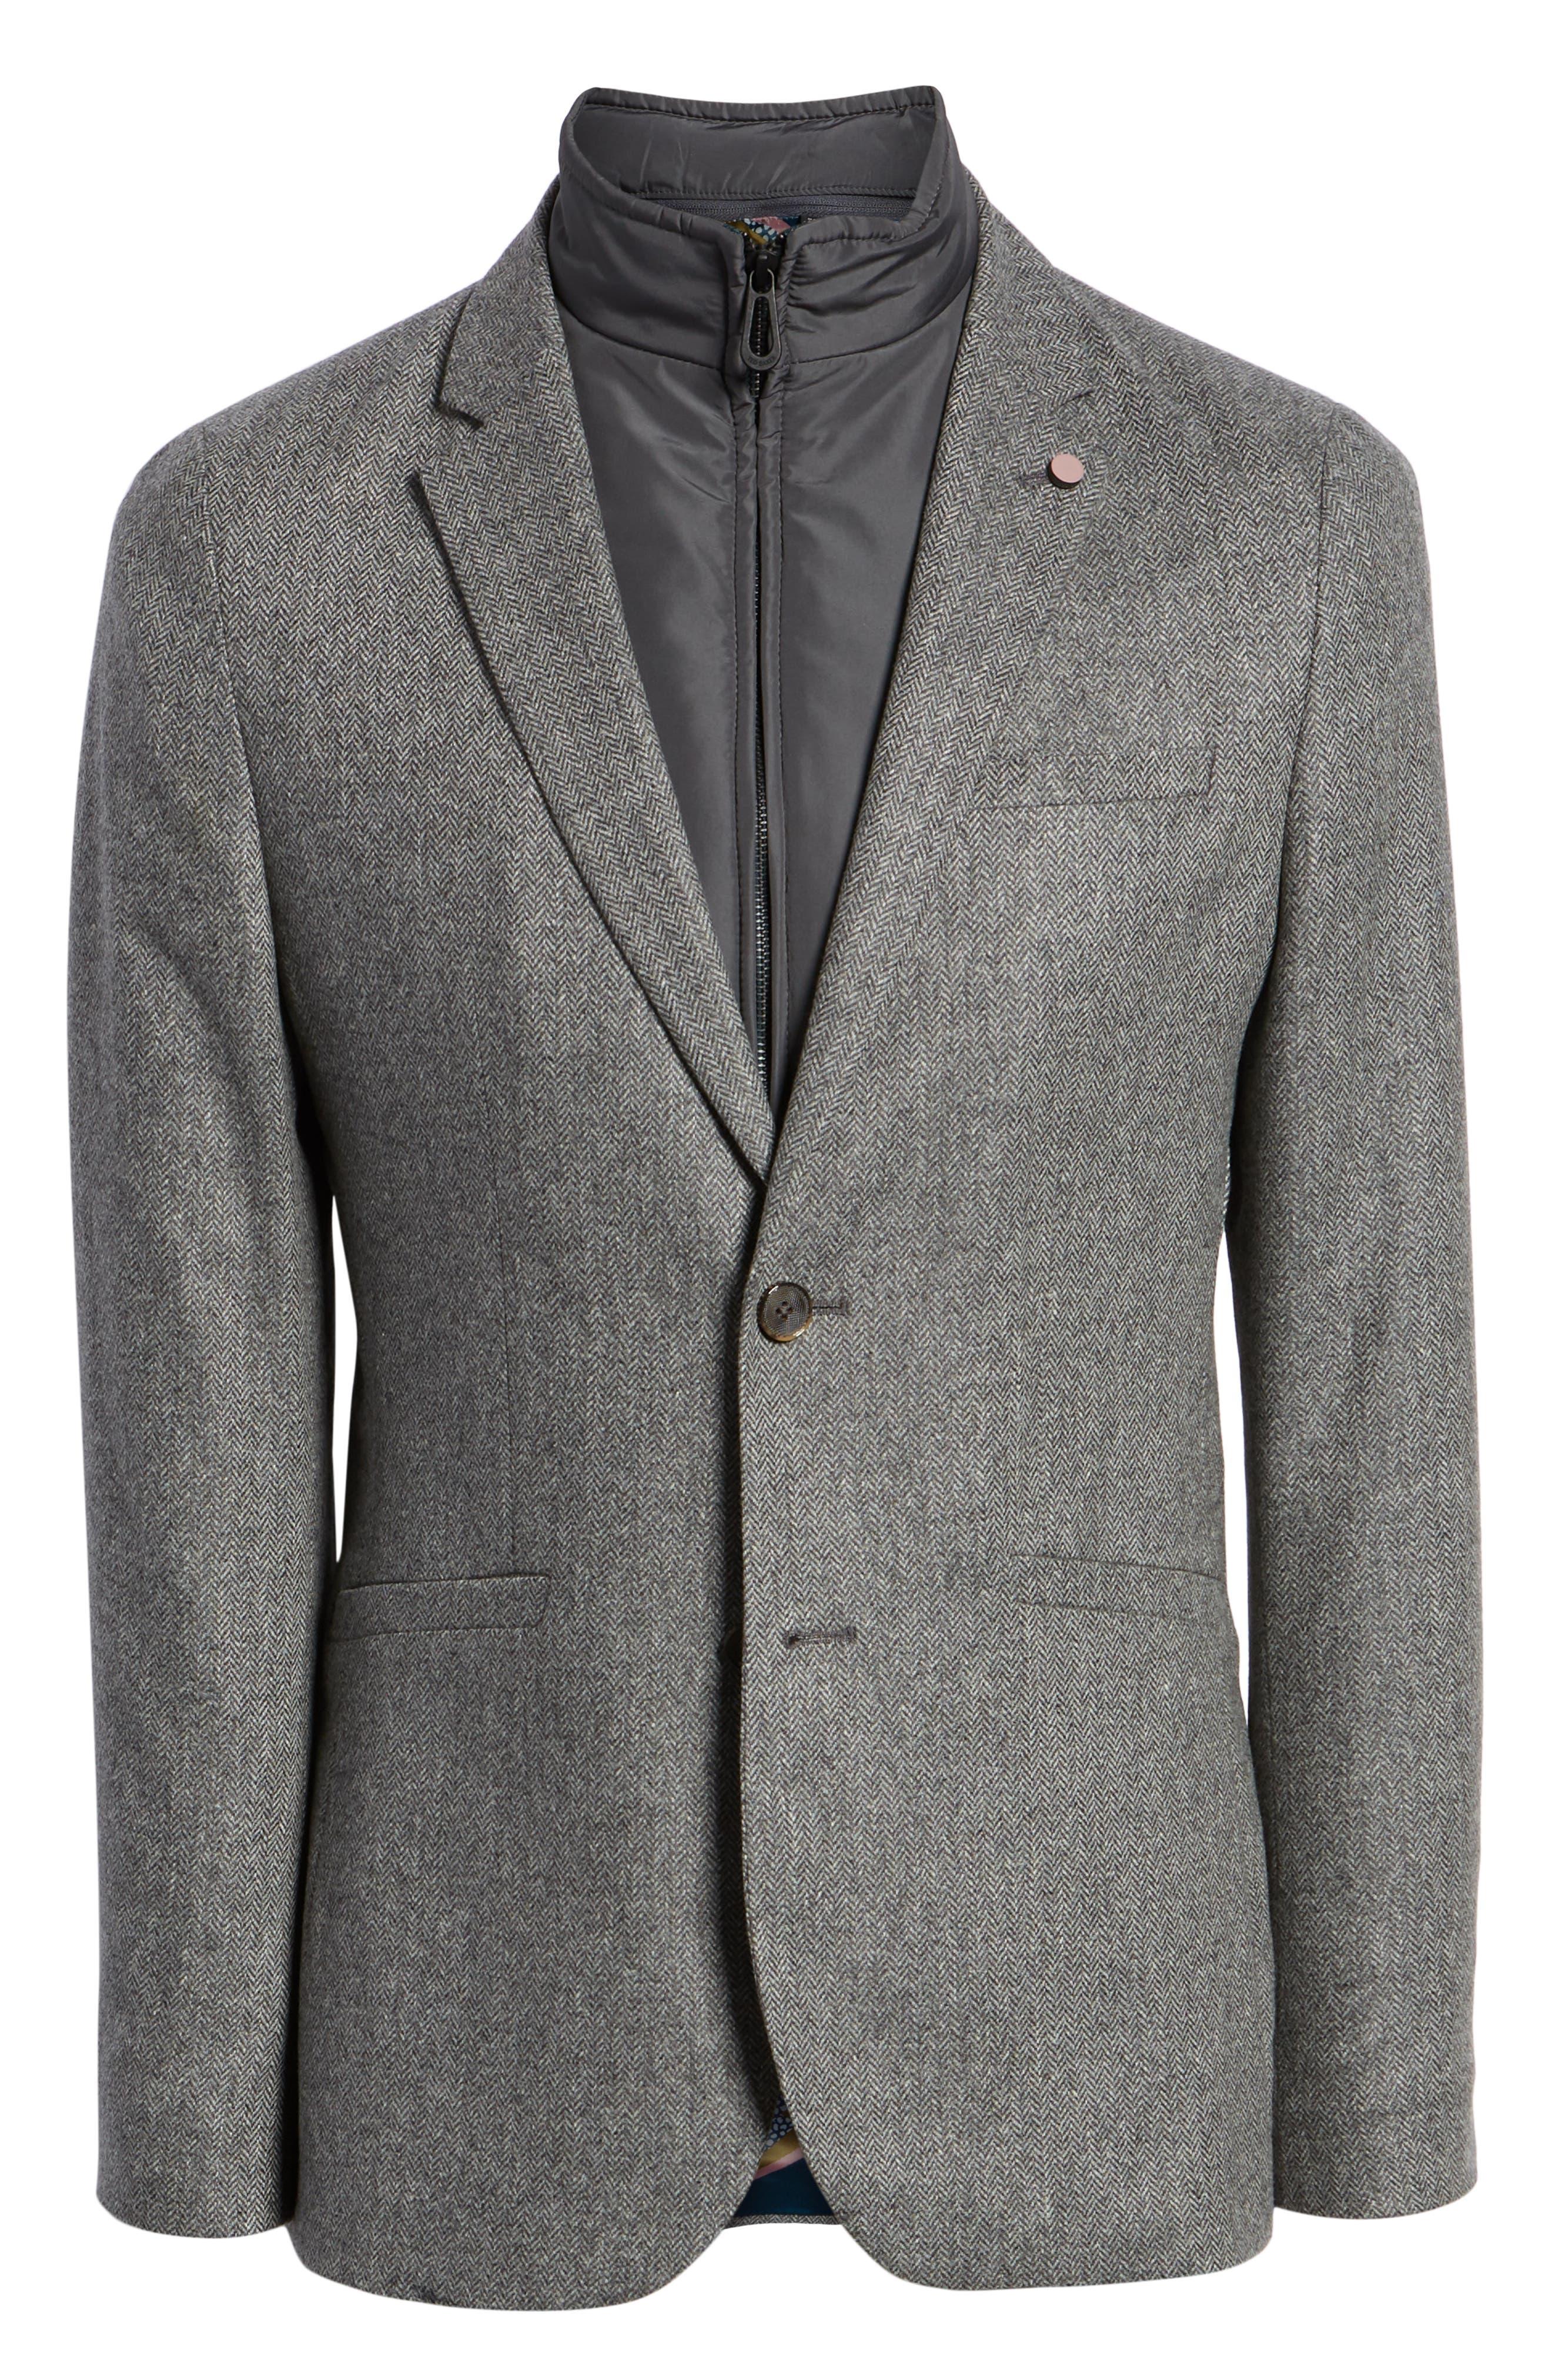 Dual Look Herringbone Jacket,                             Alternate thumbnail 5, color,                             LIGHT GREY